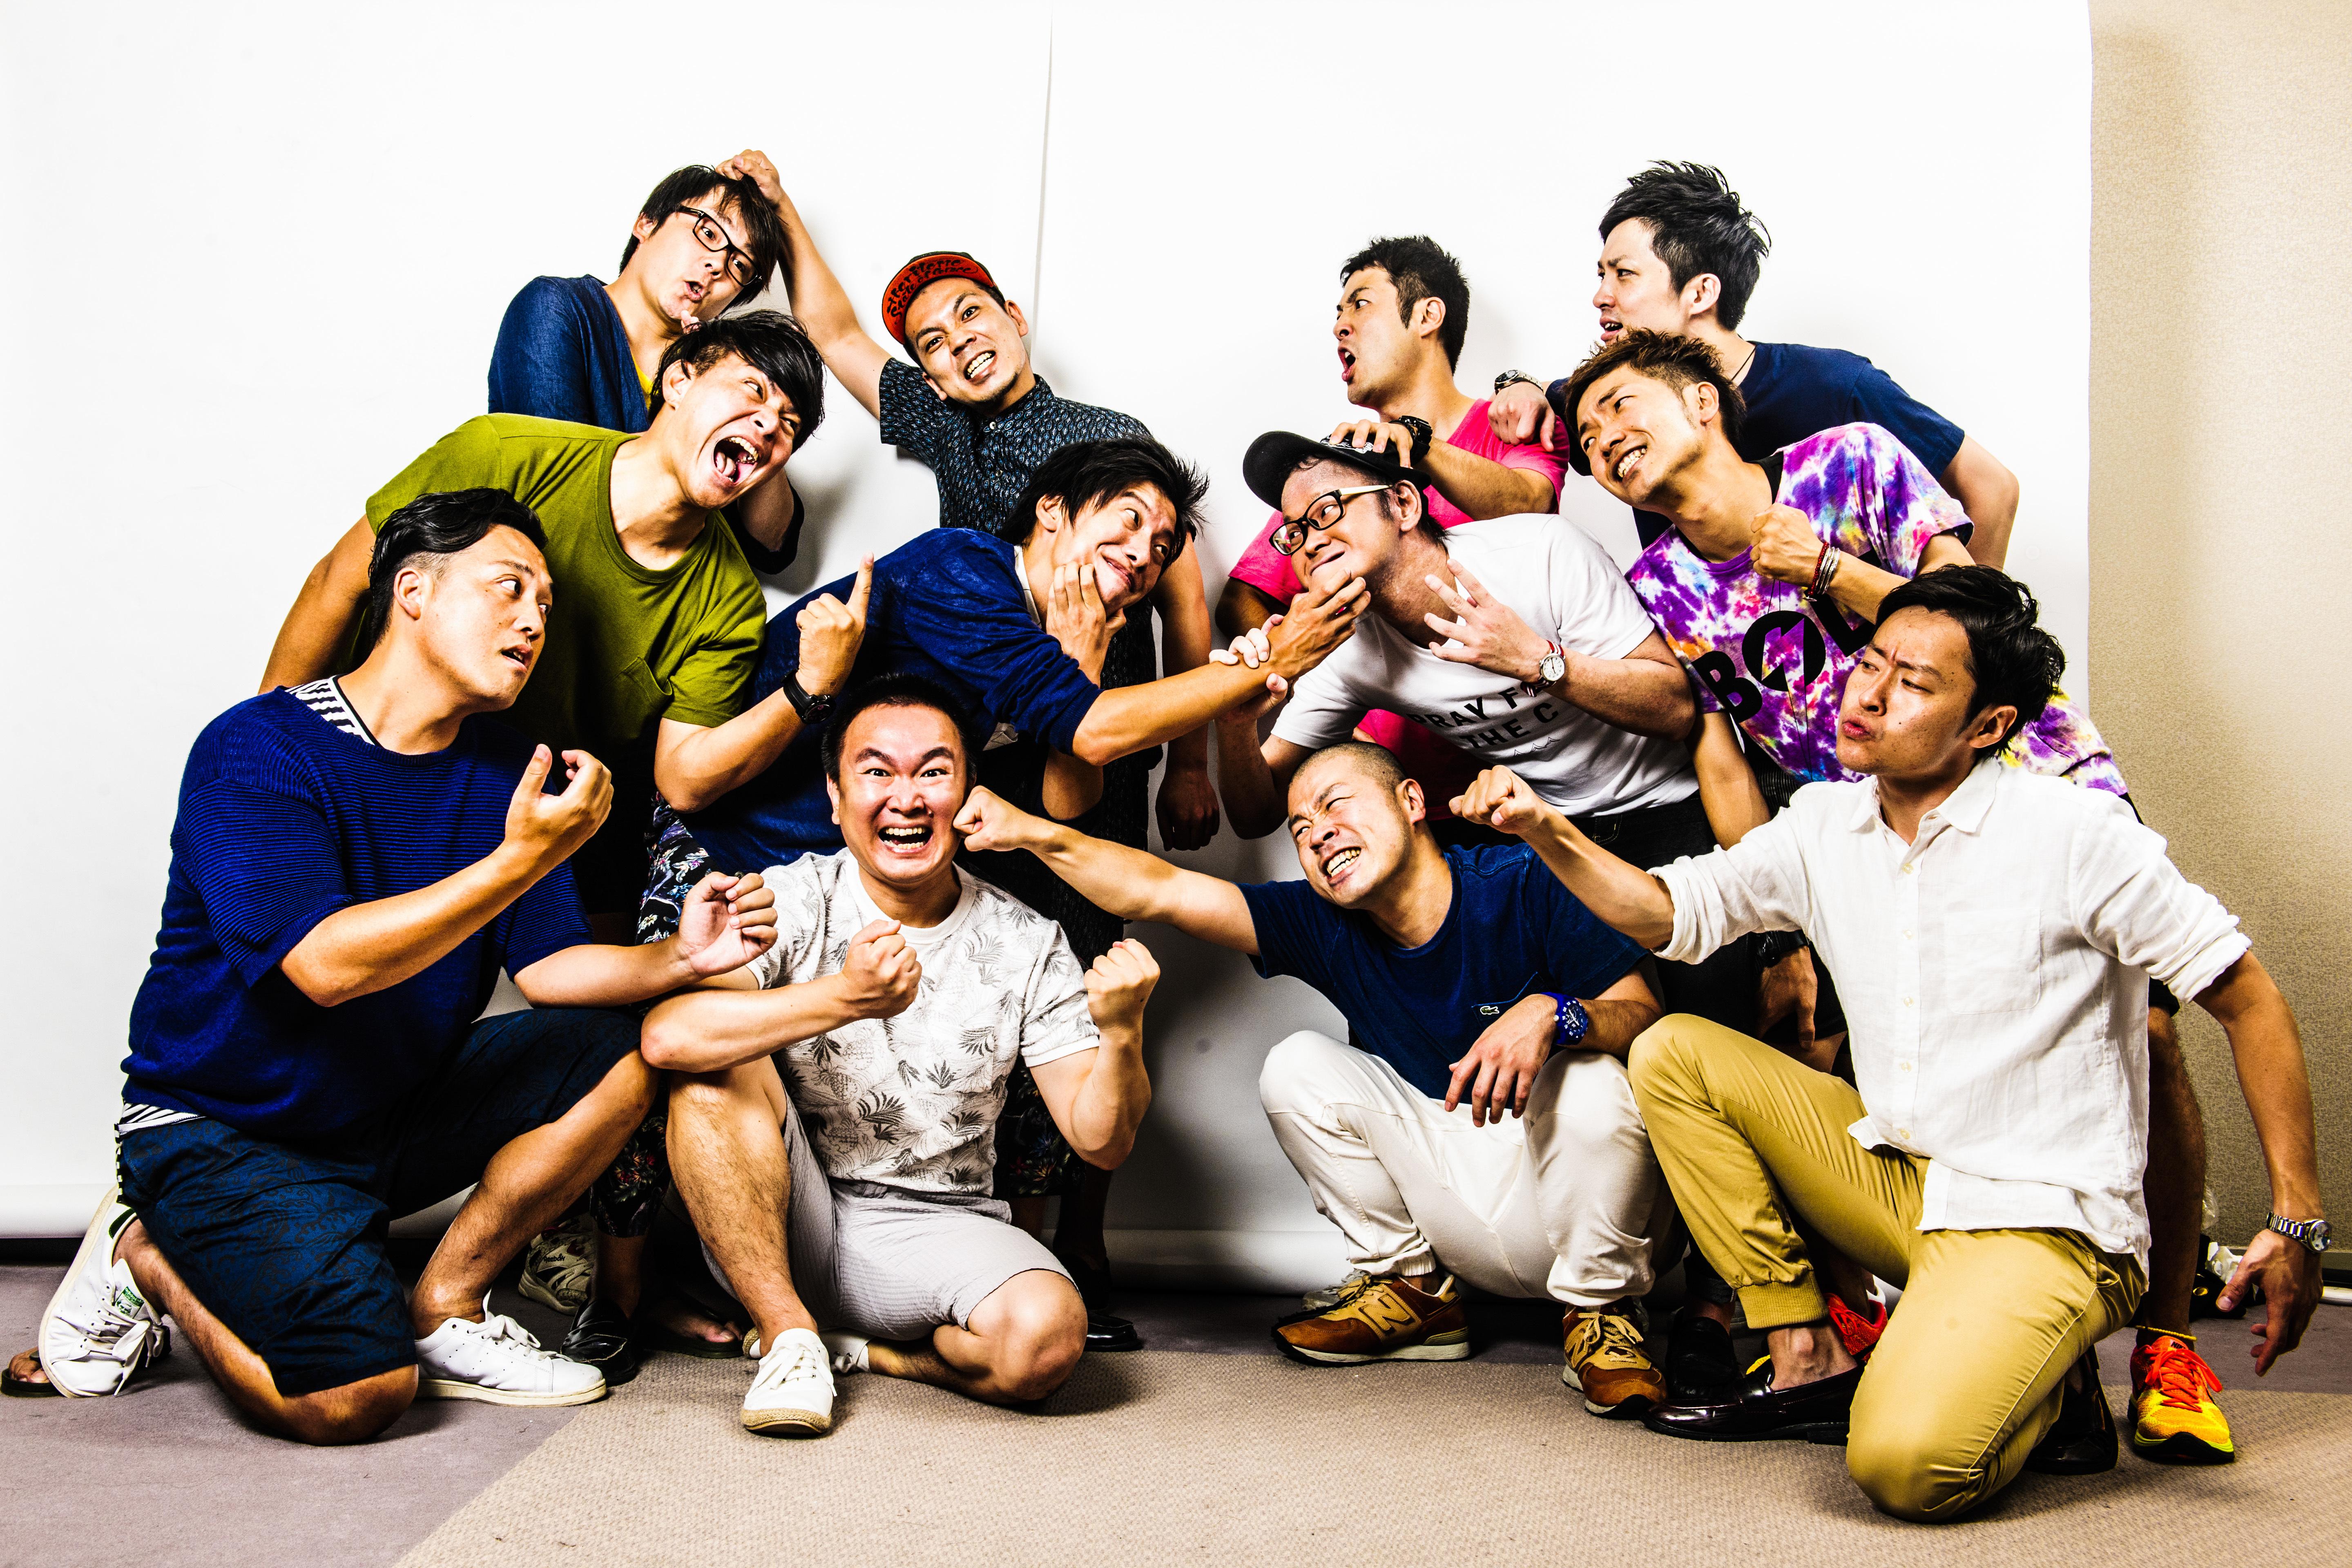 http://www.syumatsu.jp/photos/uncategorized/2015/08/25/20150825130623-256a38a4974532b2154ba52d71b6c9d1409739c3.jpg